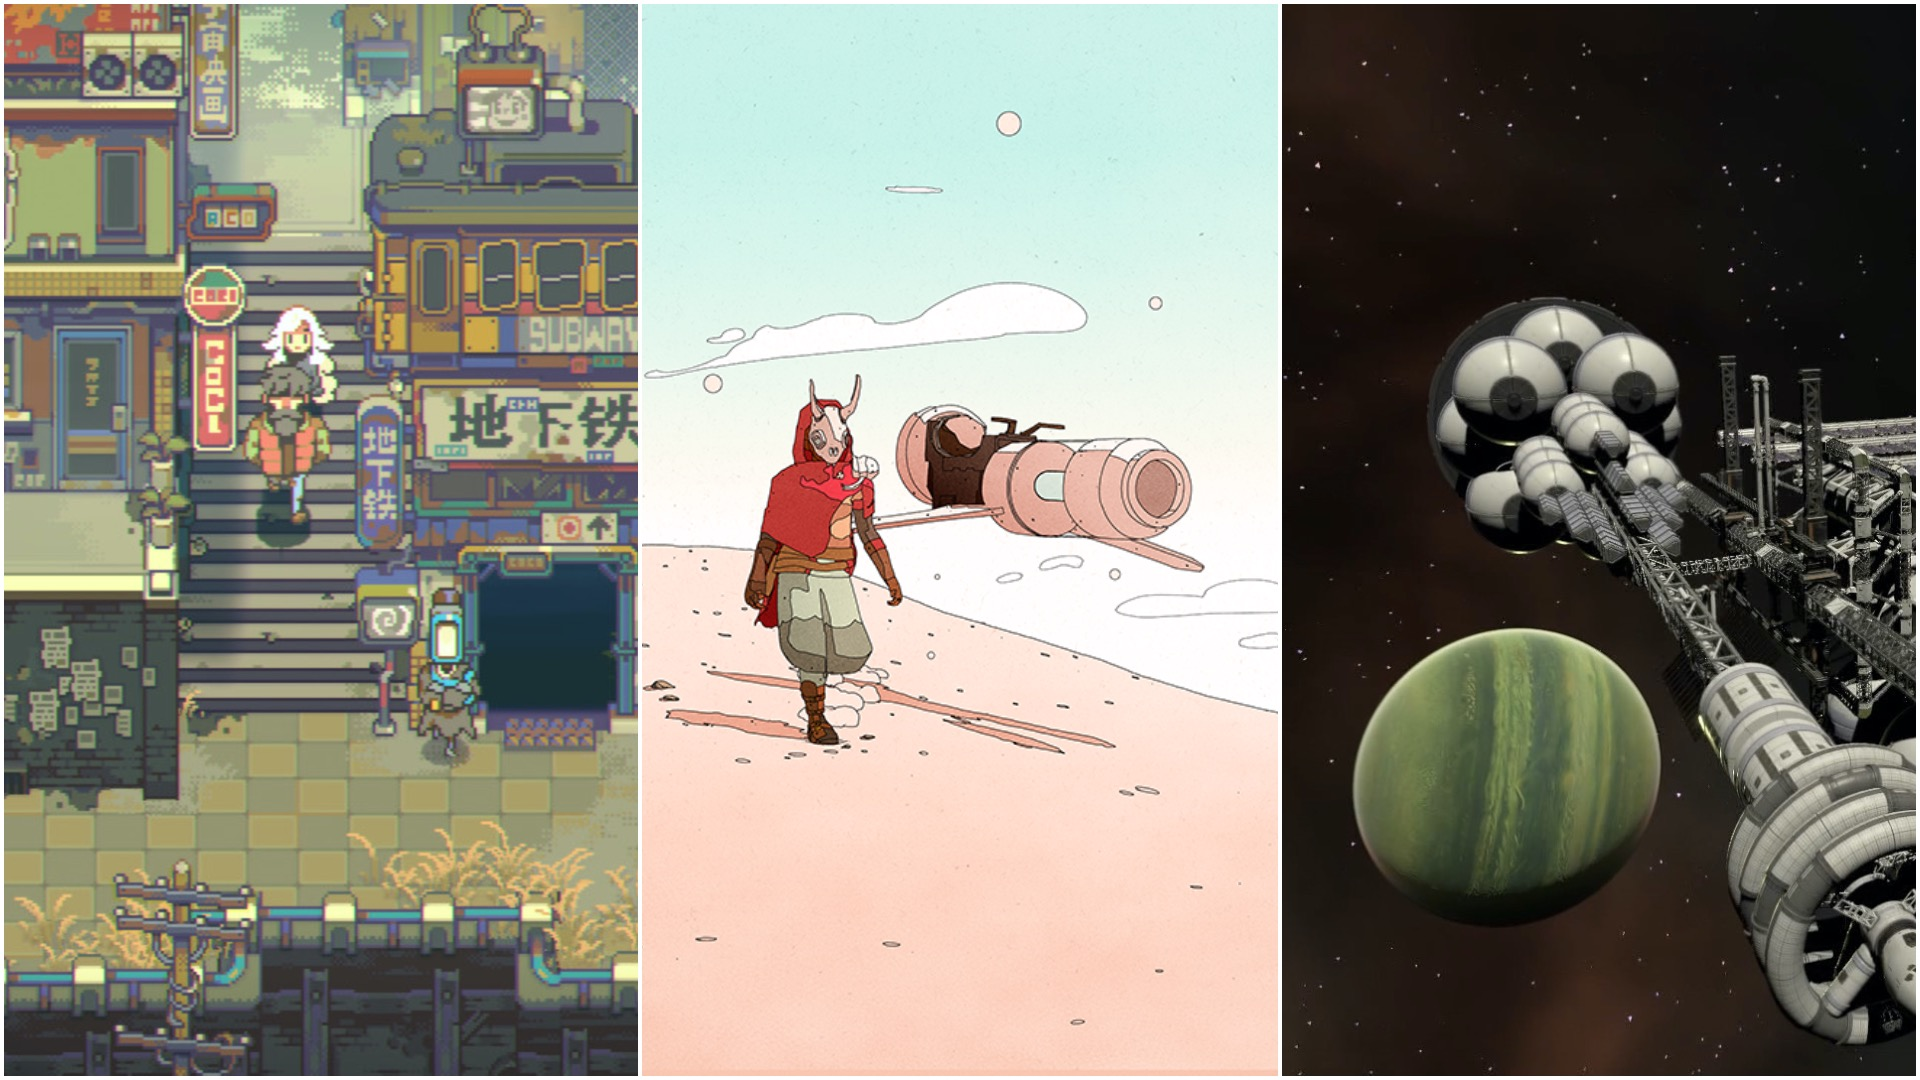 Top 7 Upcoming Indie Games in 2020